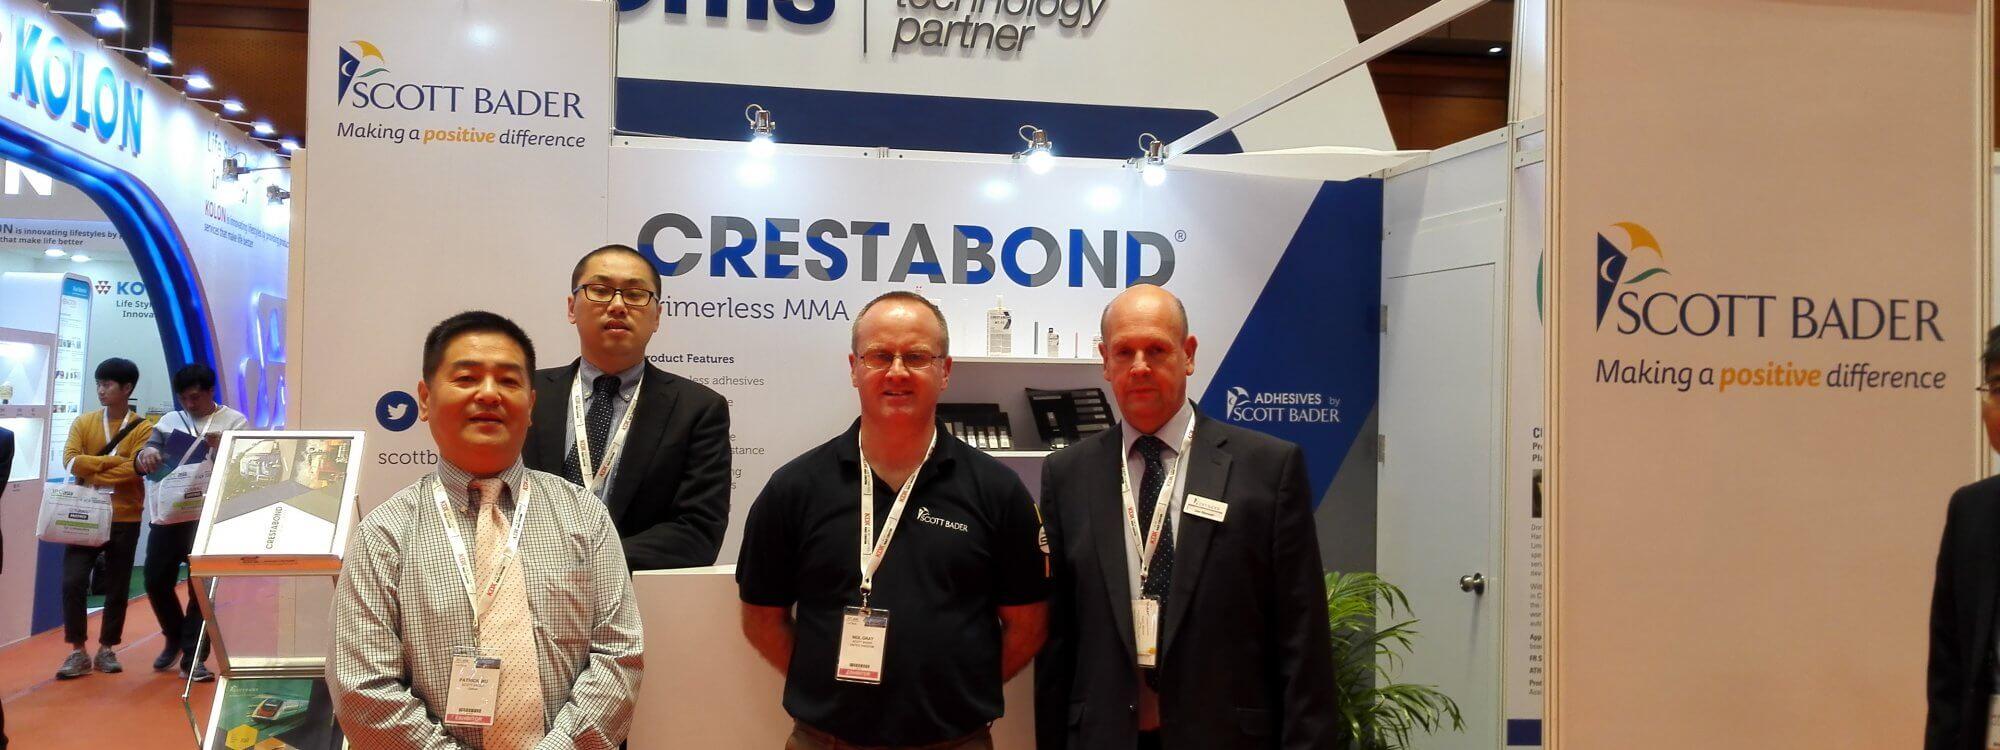 Scott Bader exhibiting at JEC Asia 2018